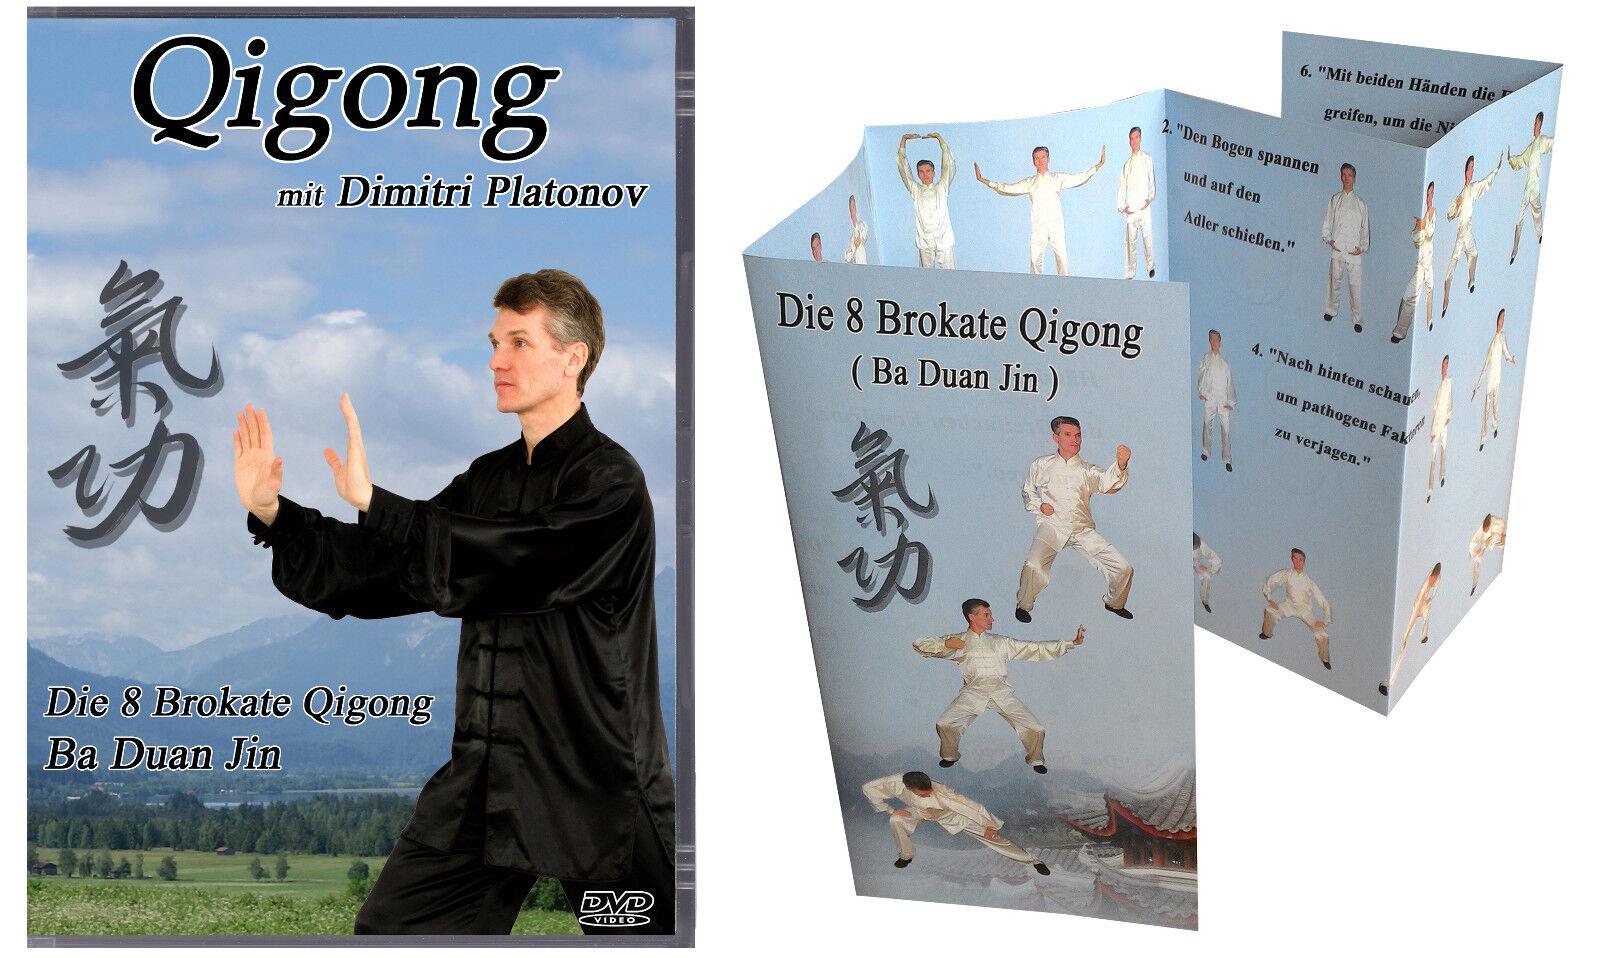 Die 8 Brokate Qigong Ba Duan Jin Die acht Brokatübungen 8 Brokat Übungen DVD